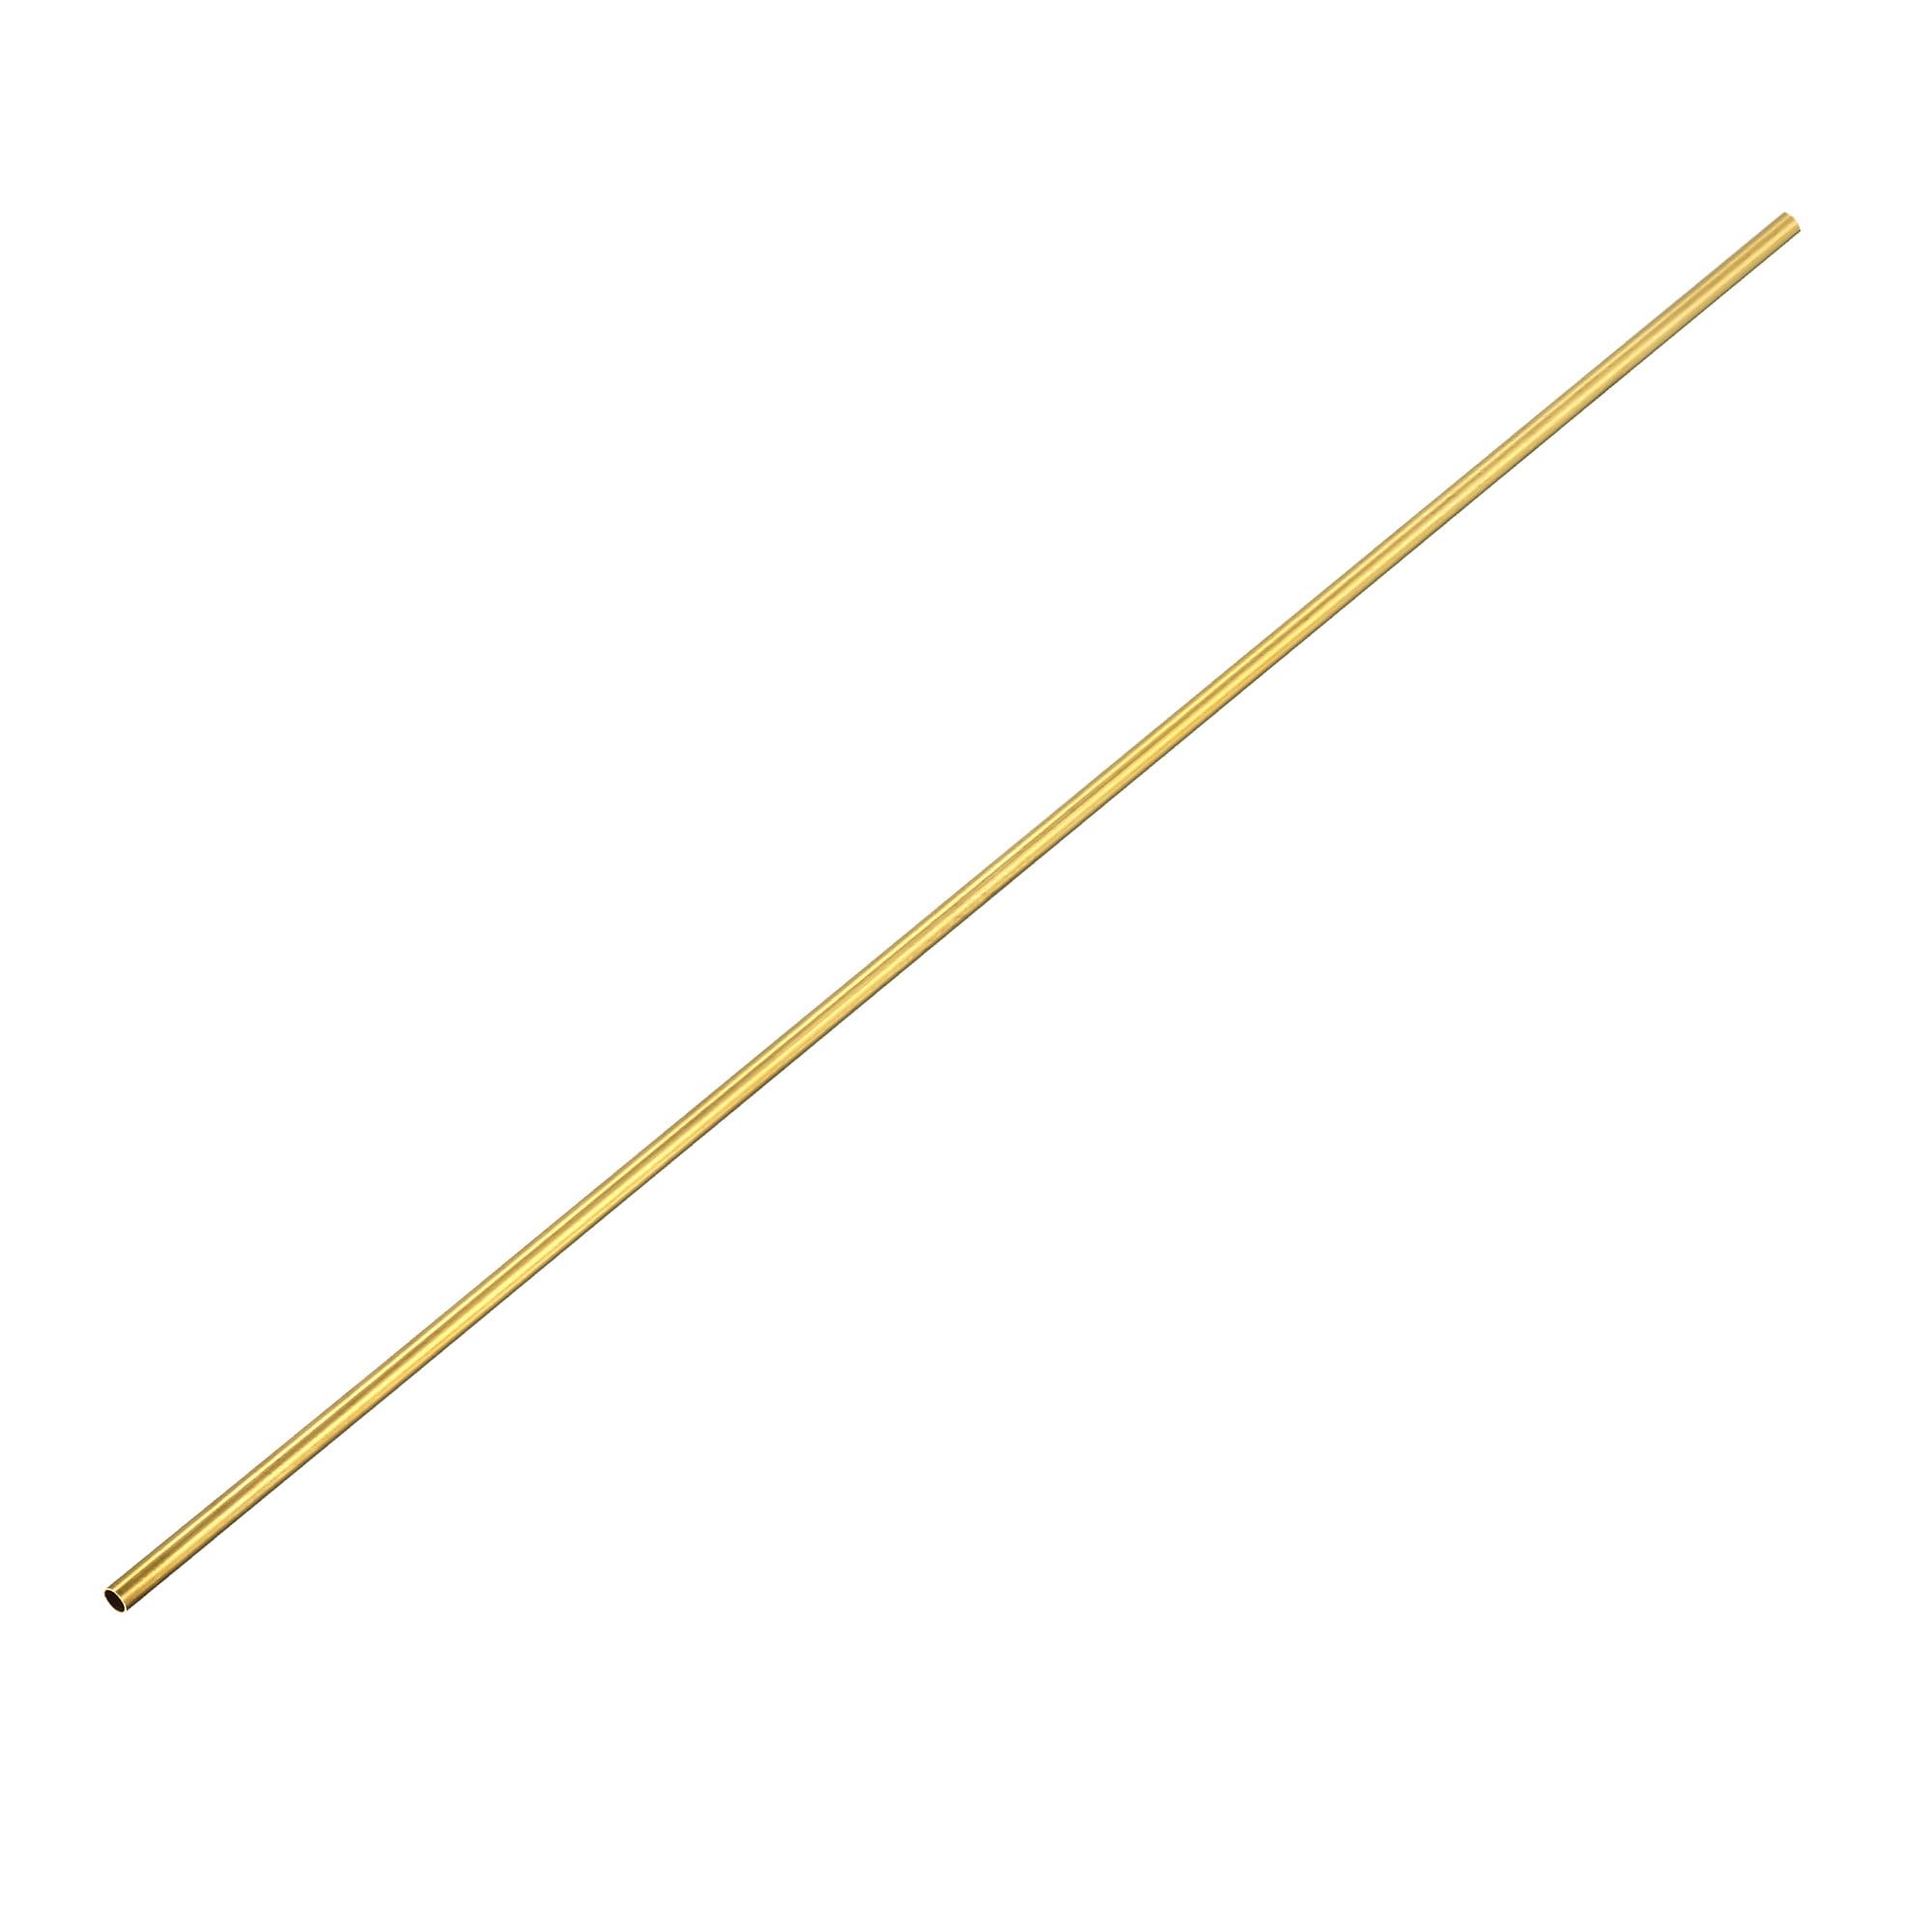 4PCS 4mm x 5mm x 500mm Brass Pipe Tube Round Bar Rod